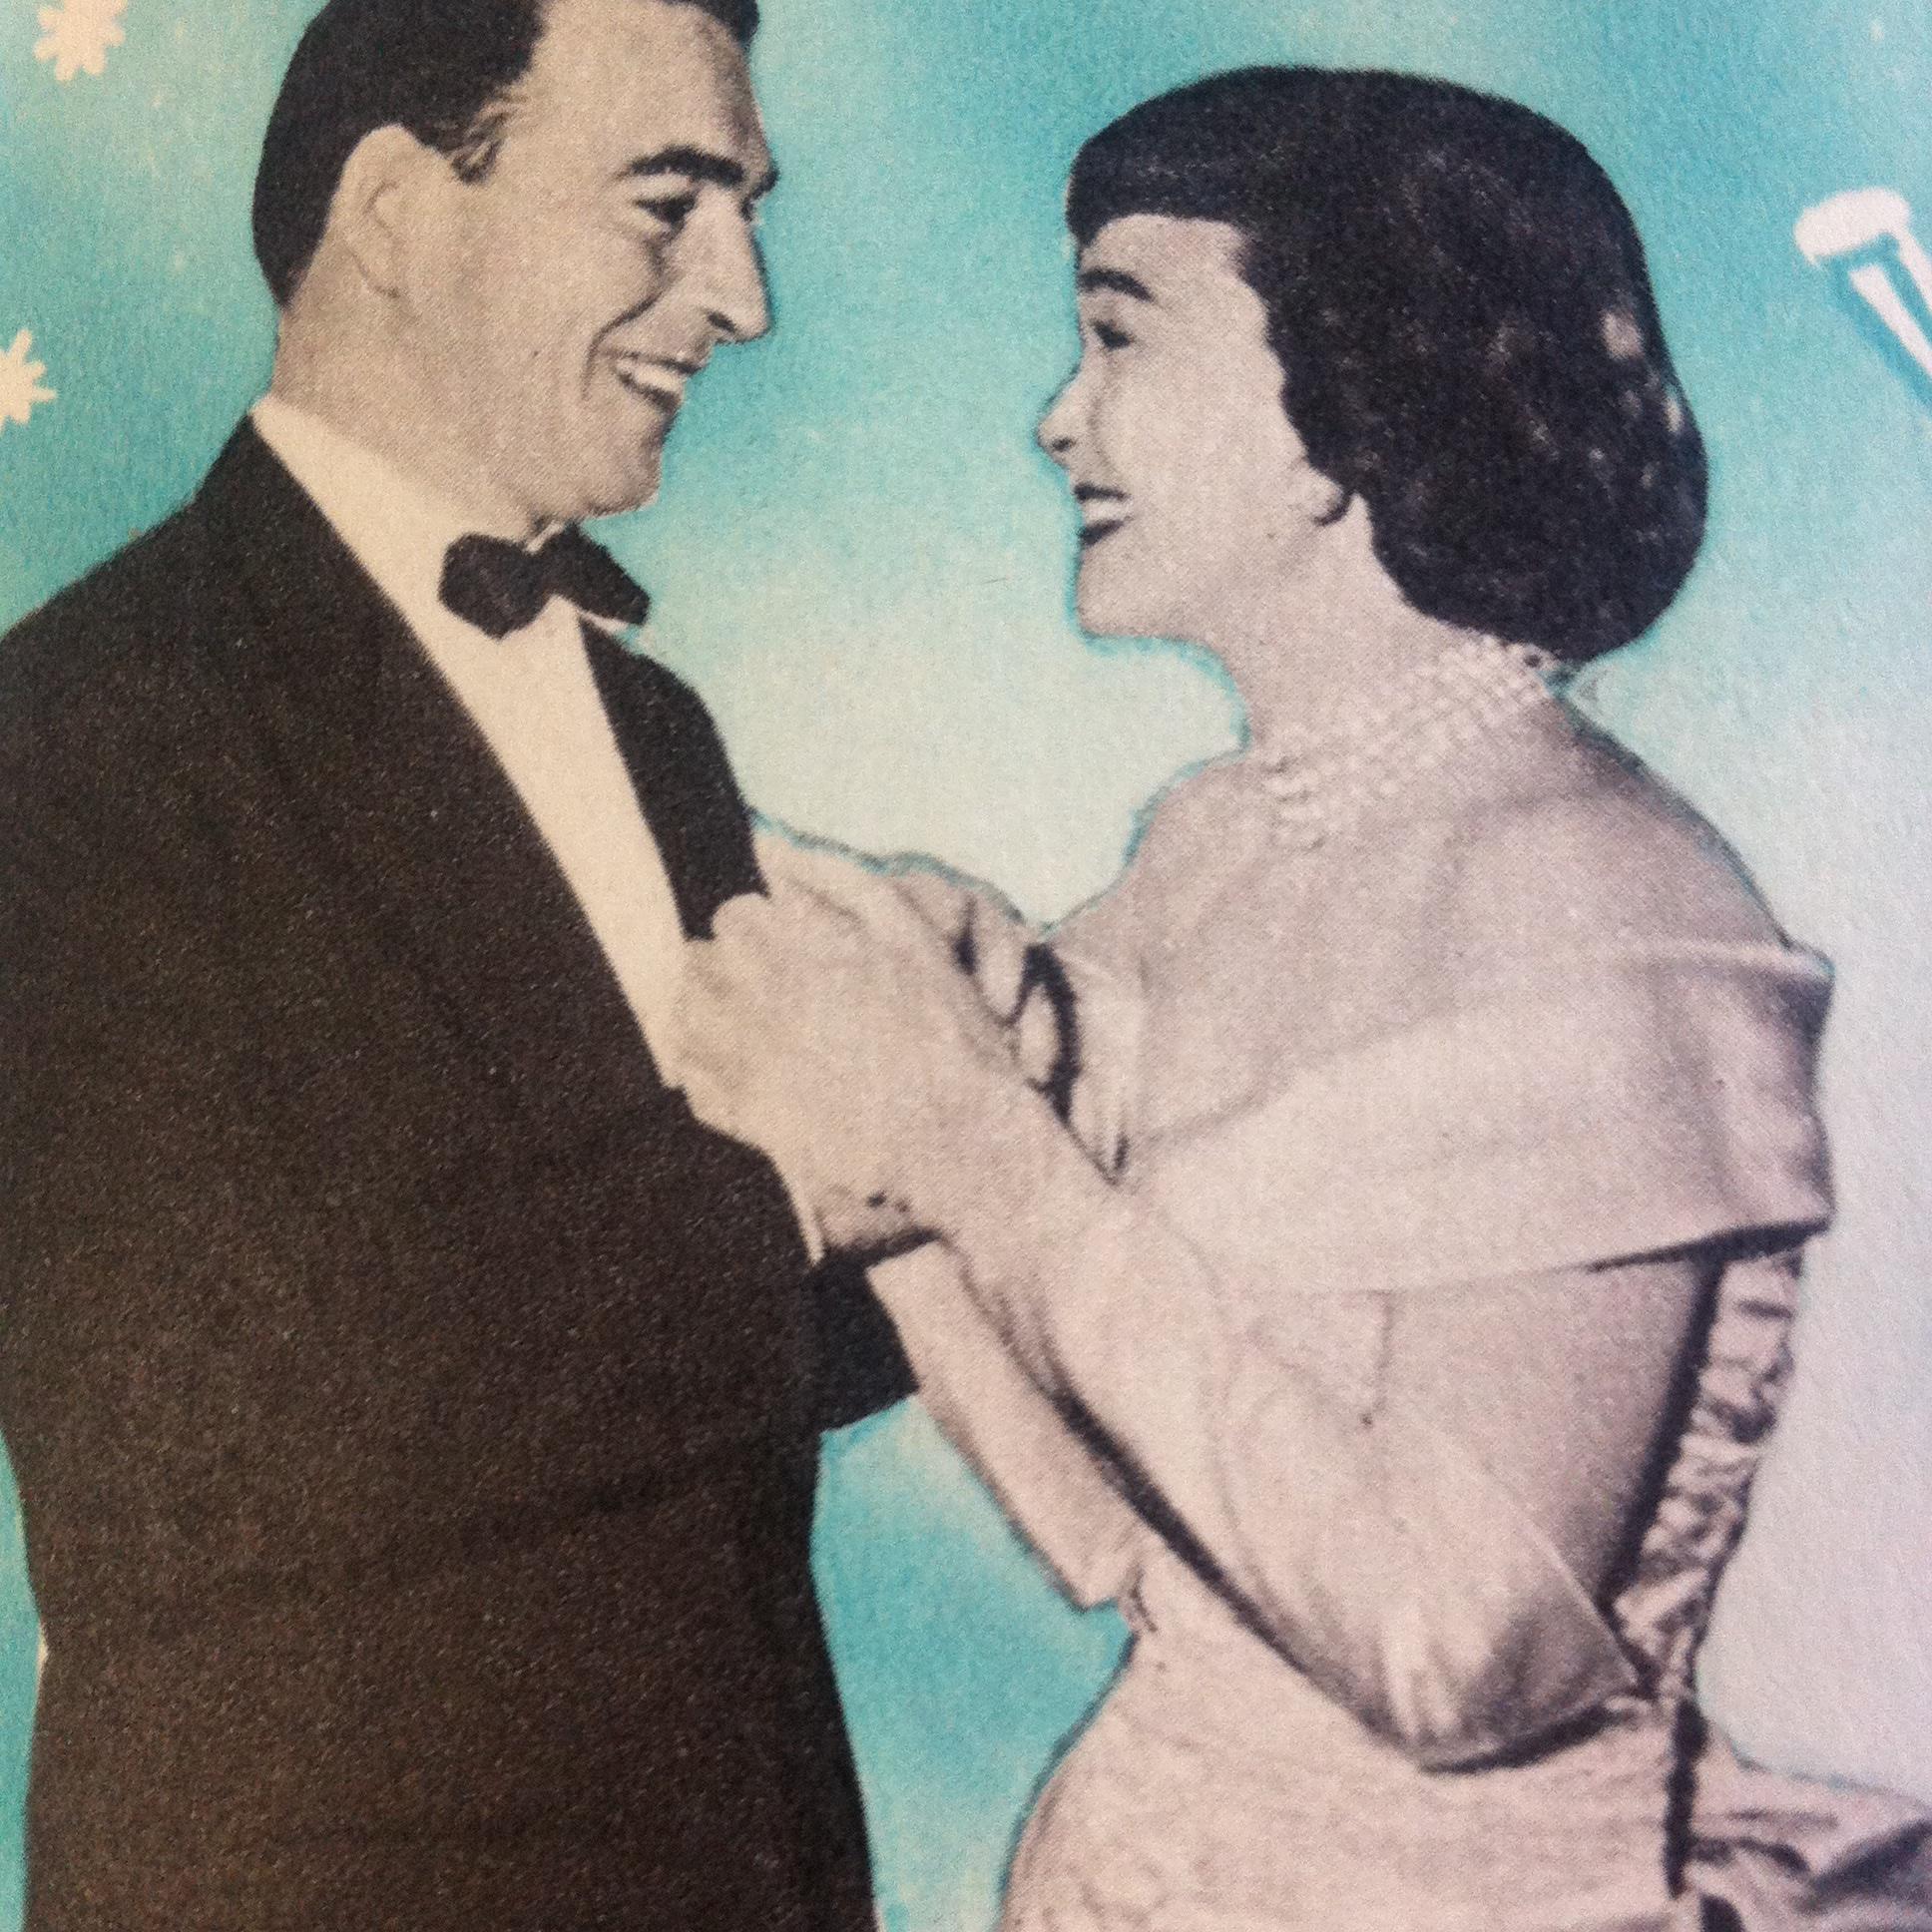 Stephen McNally and Jane Wyman in Johnny Belinda (1948)